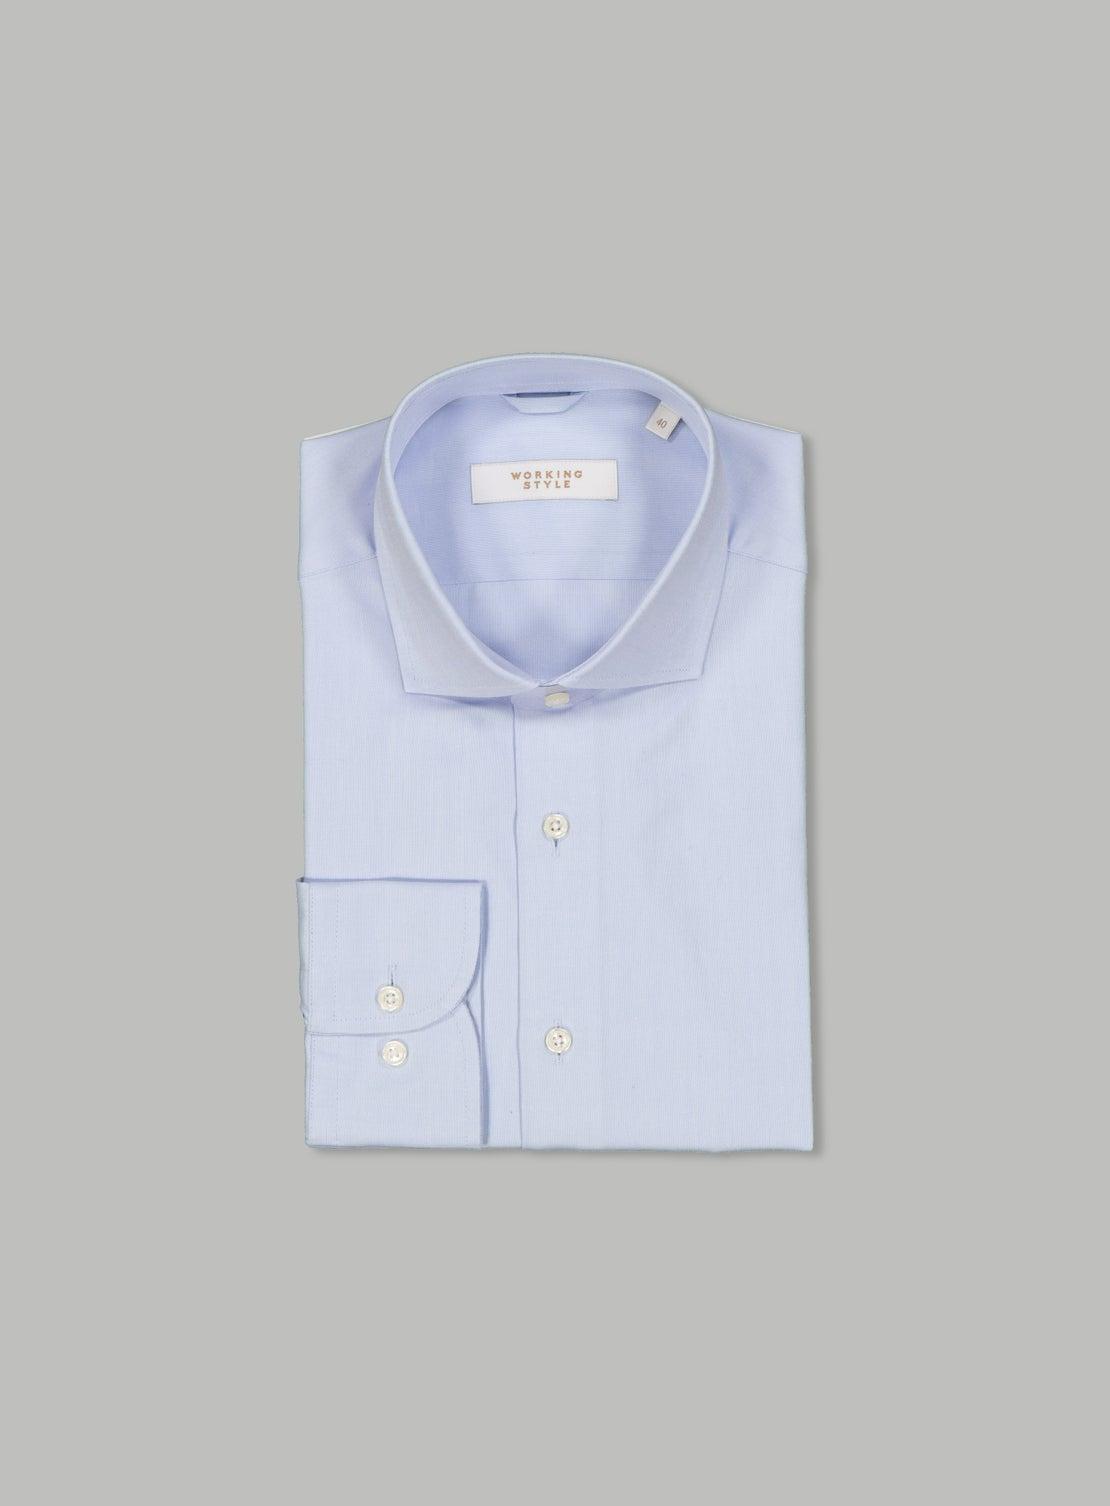 DM Classic Blue Shirt